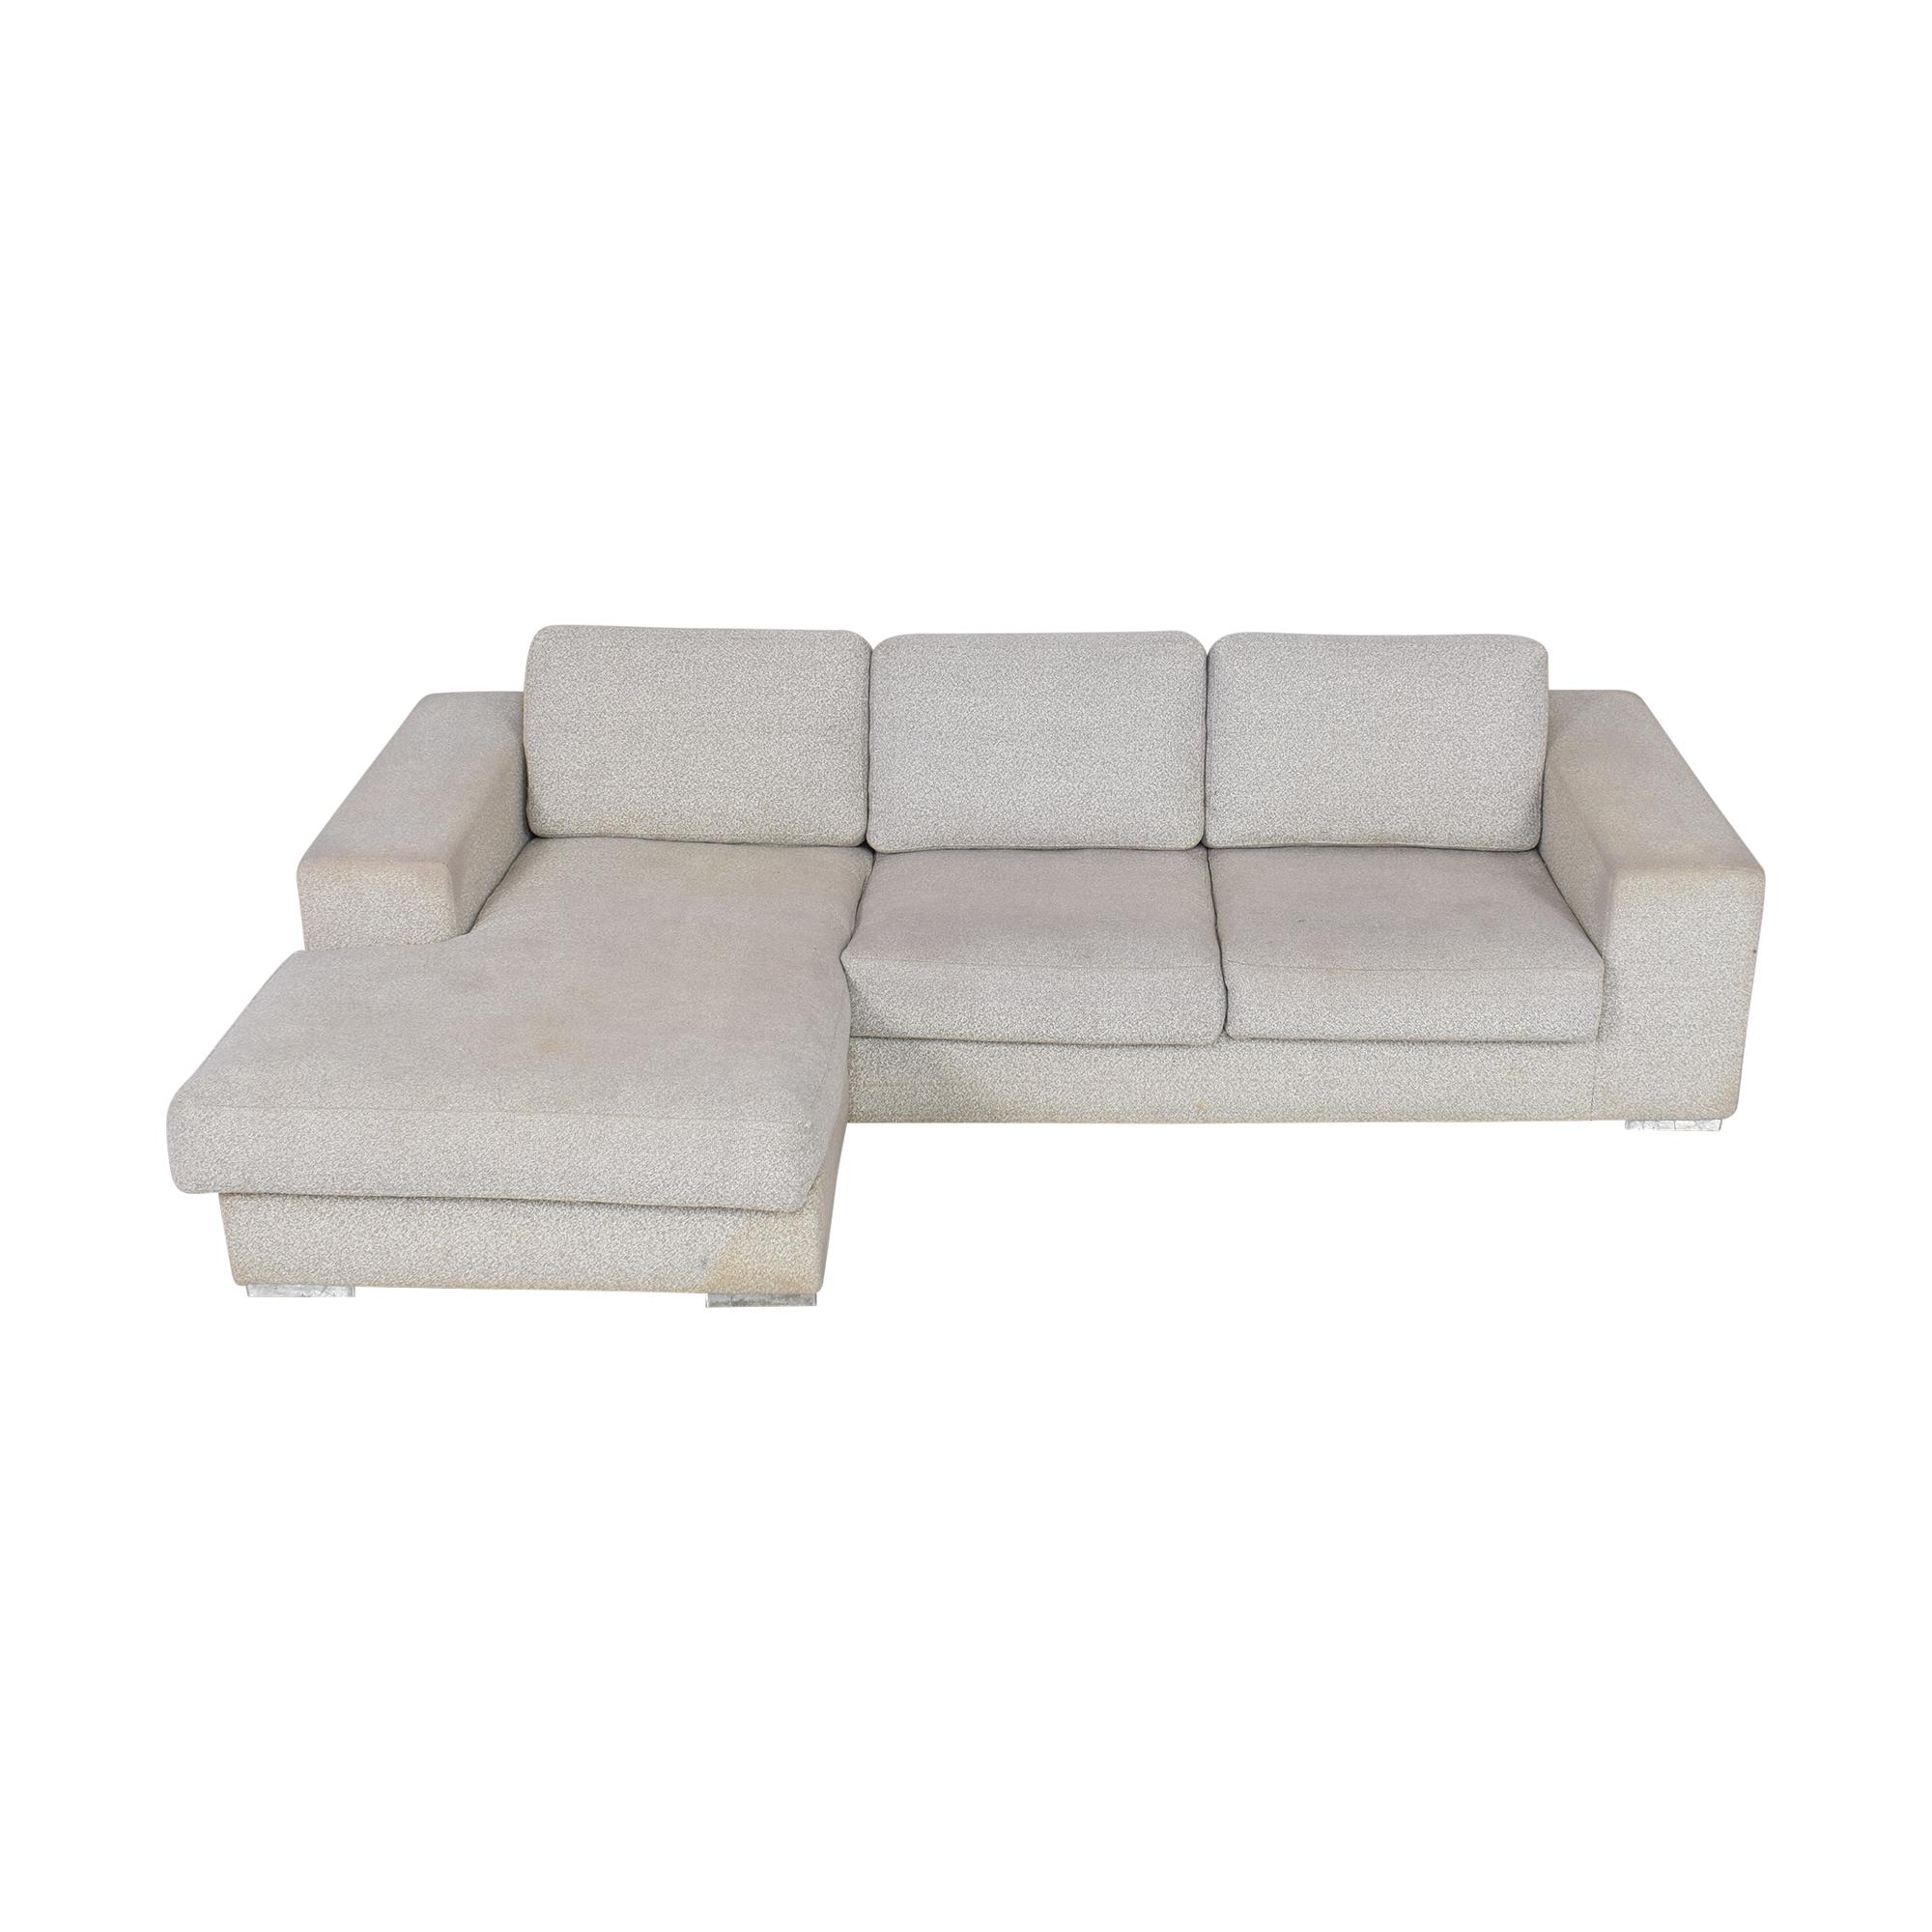 BoConcept BoConcept Chaise Sectional Sofa pa